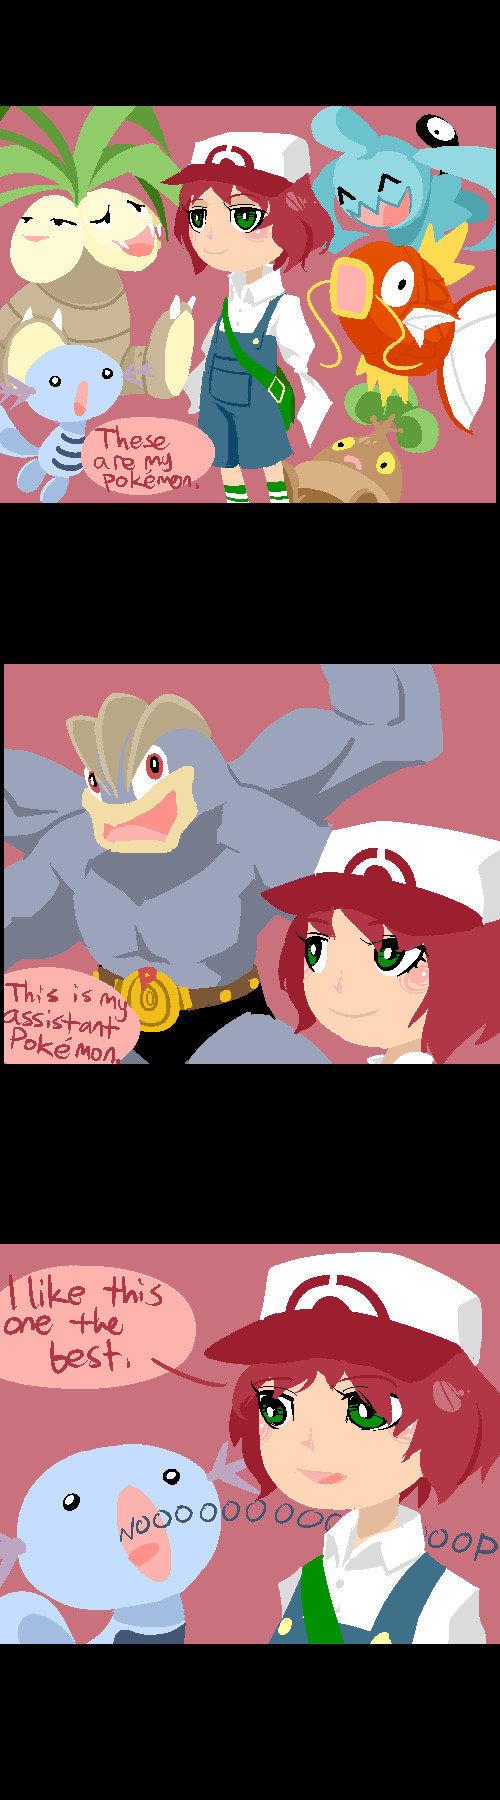 Rin's Pokemons. not mine here is source:asktezukarin.tumblr.com/page/2.. Misha's favorite pokemon rin has tumblr